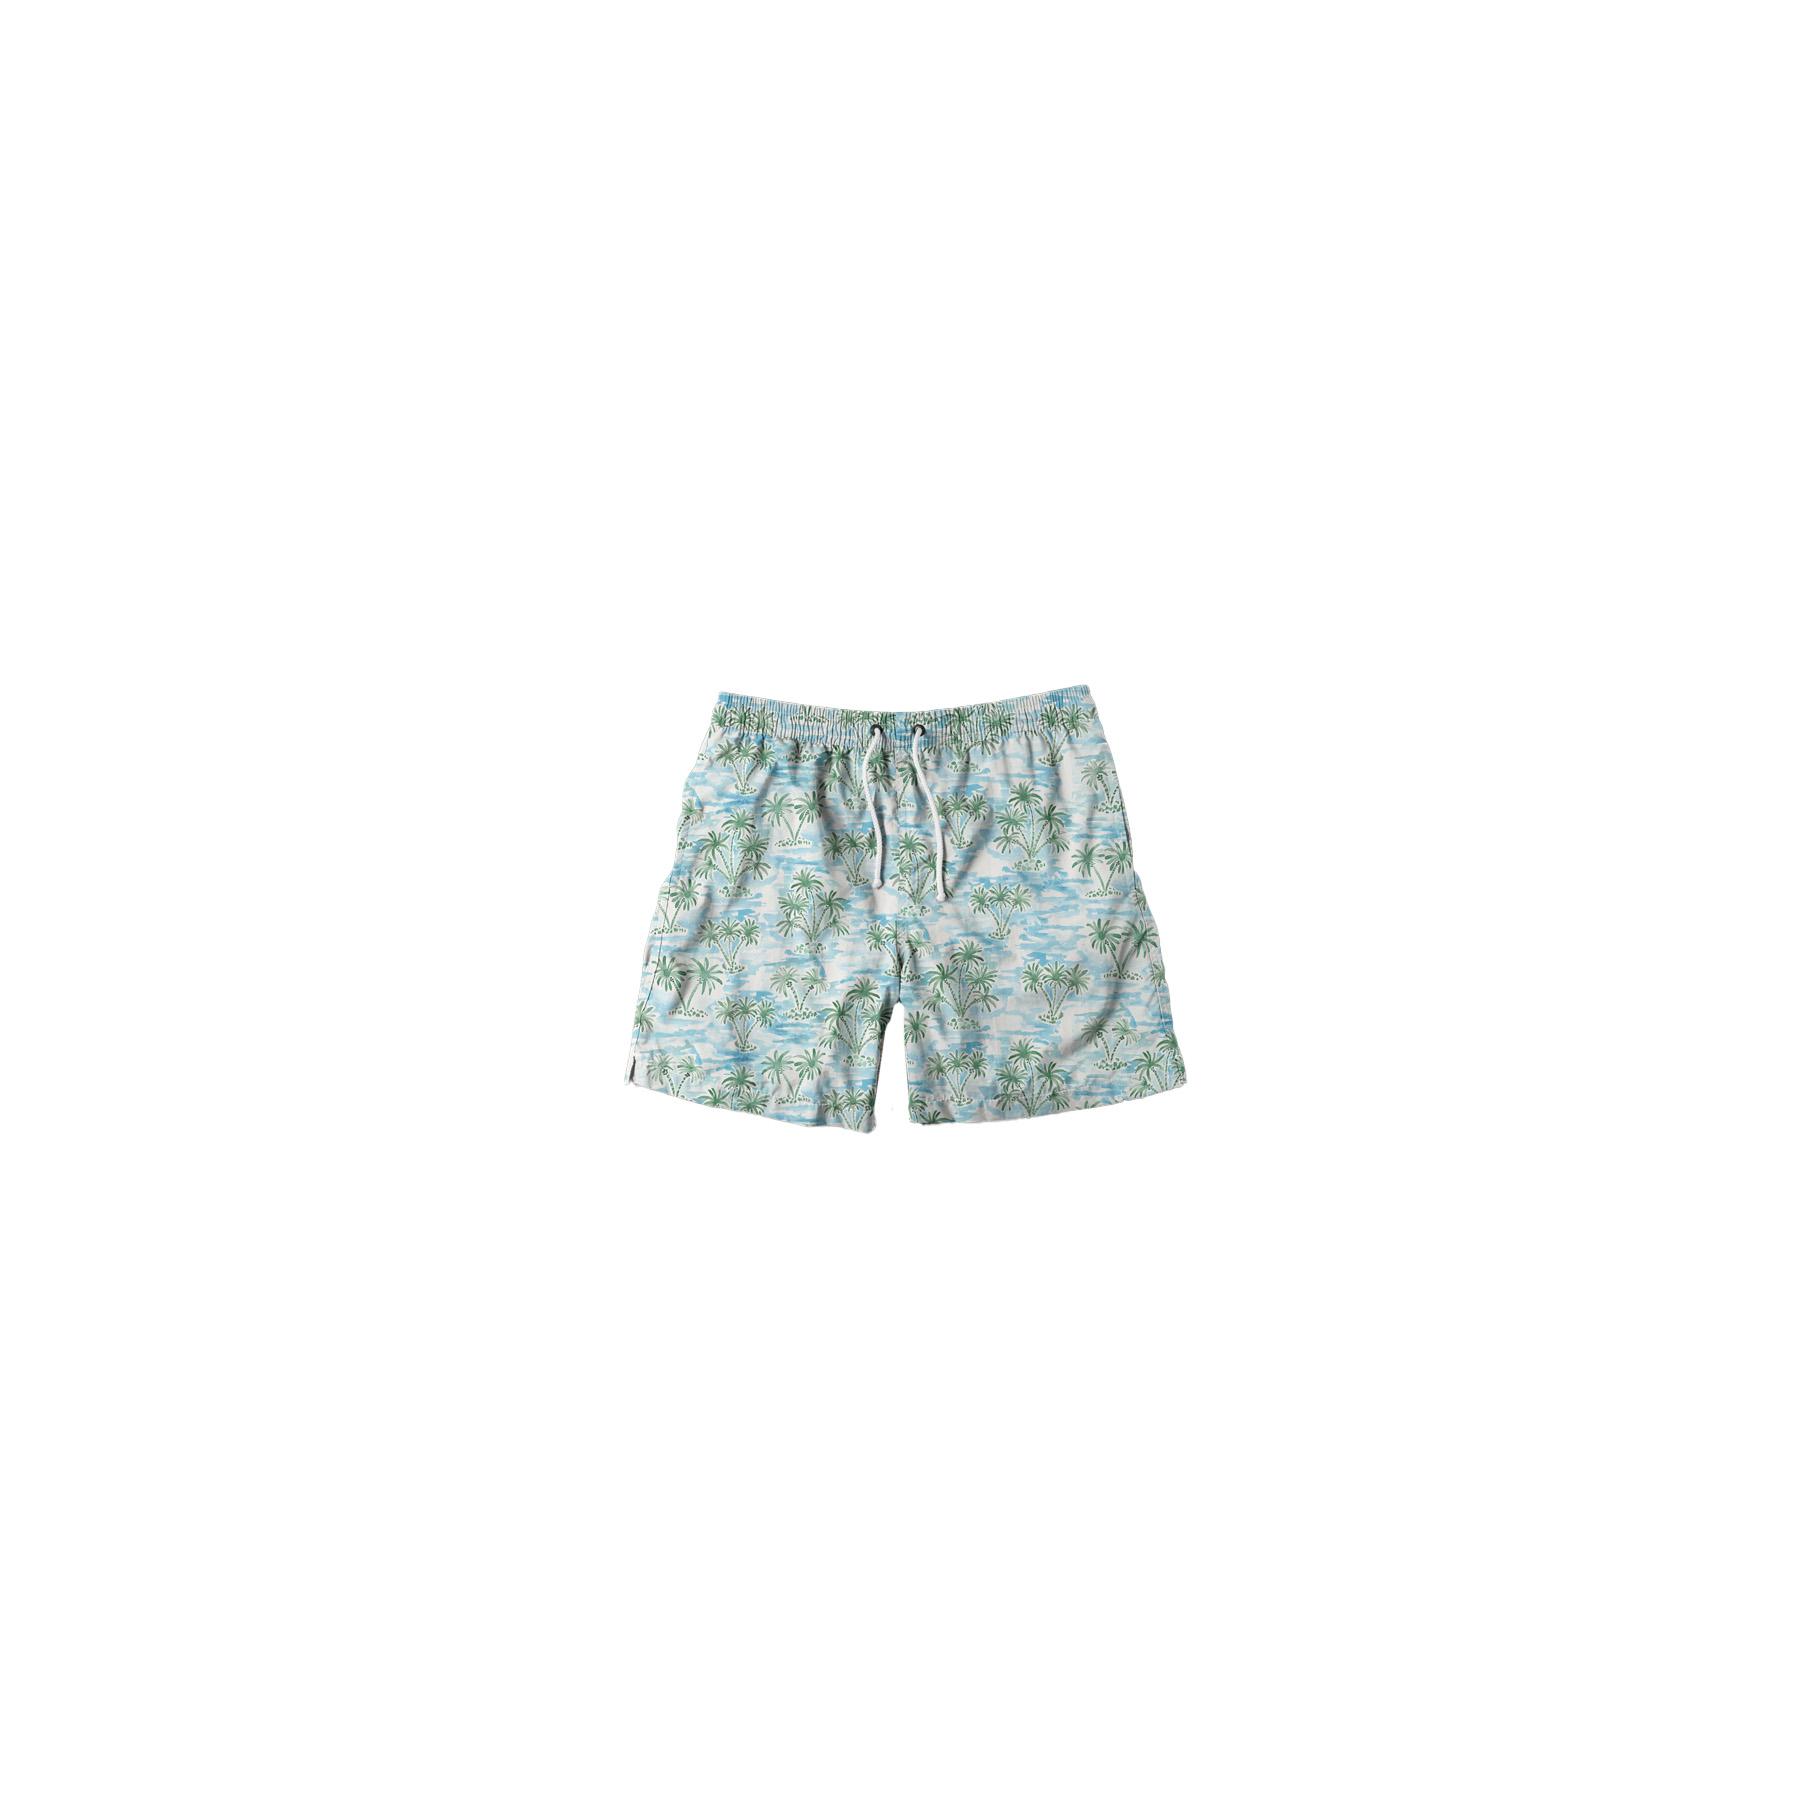 Shorts Infantil Praia Estampa Tropical Pineapple